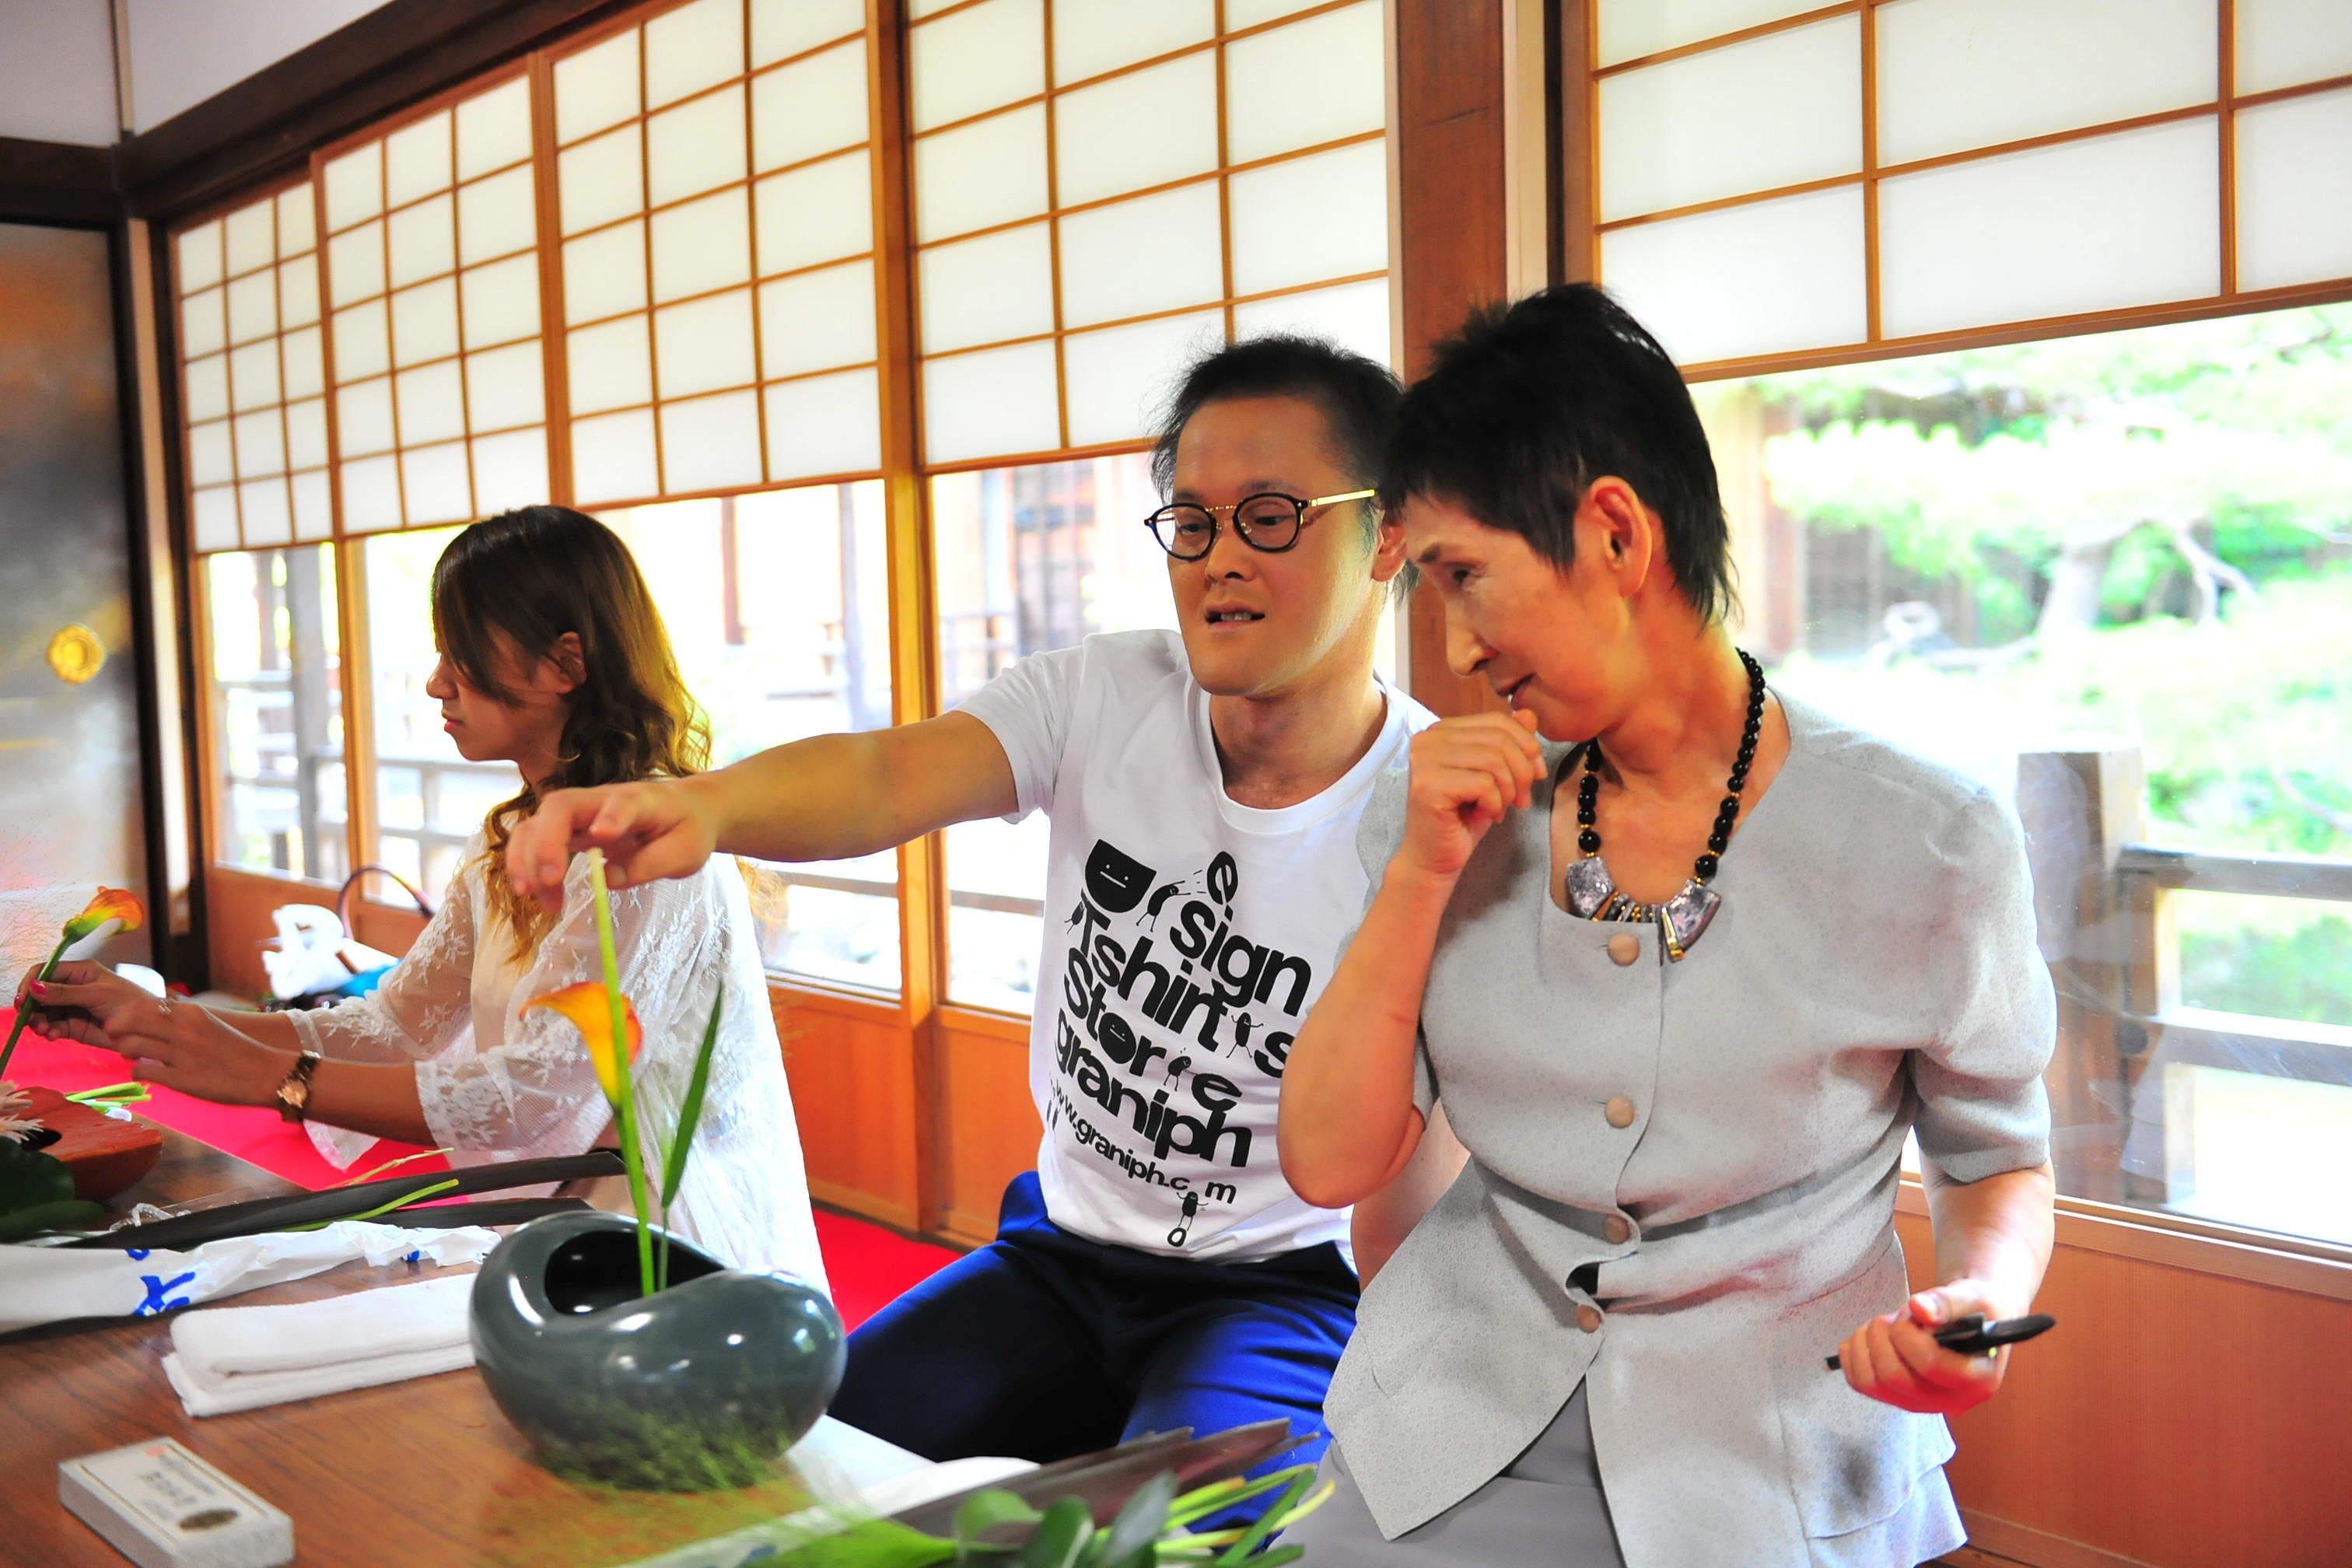 http://news.yoshimoto.co.jp/20160831204257-29e018ba4f58911c37043070bdd2527d8a6e18a5.jpg